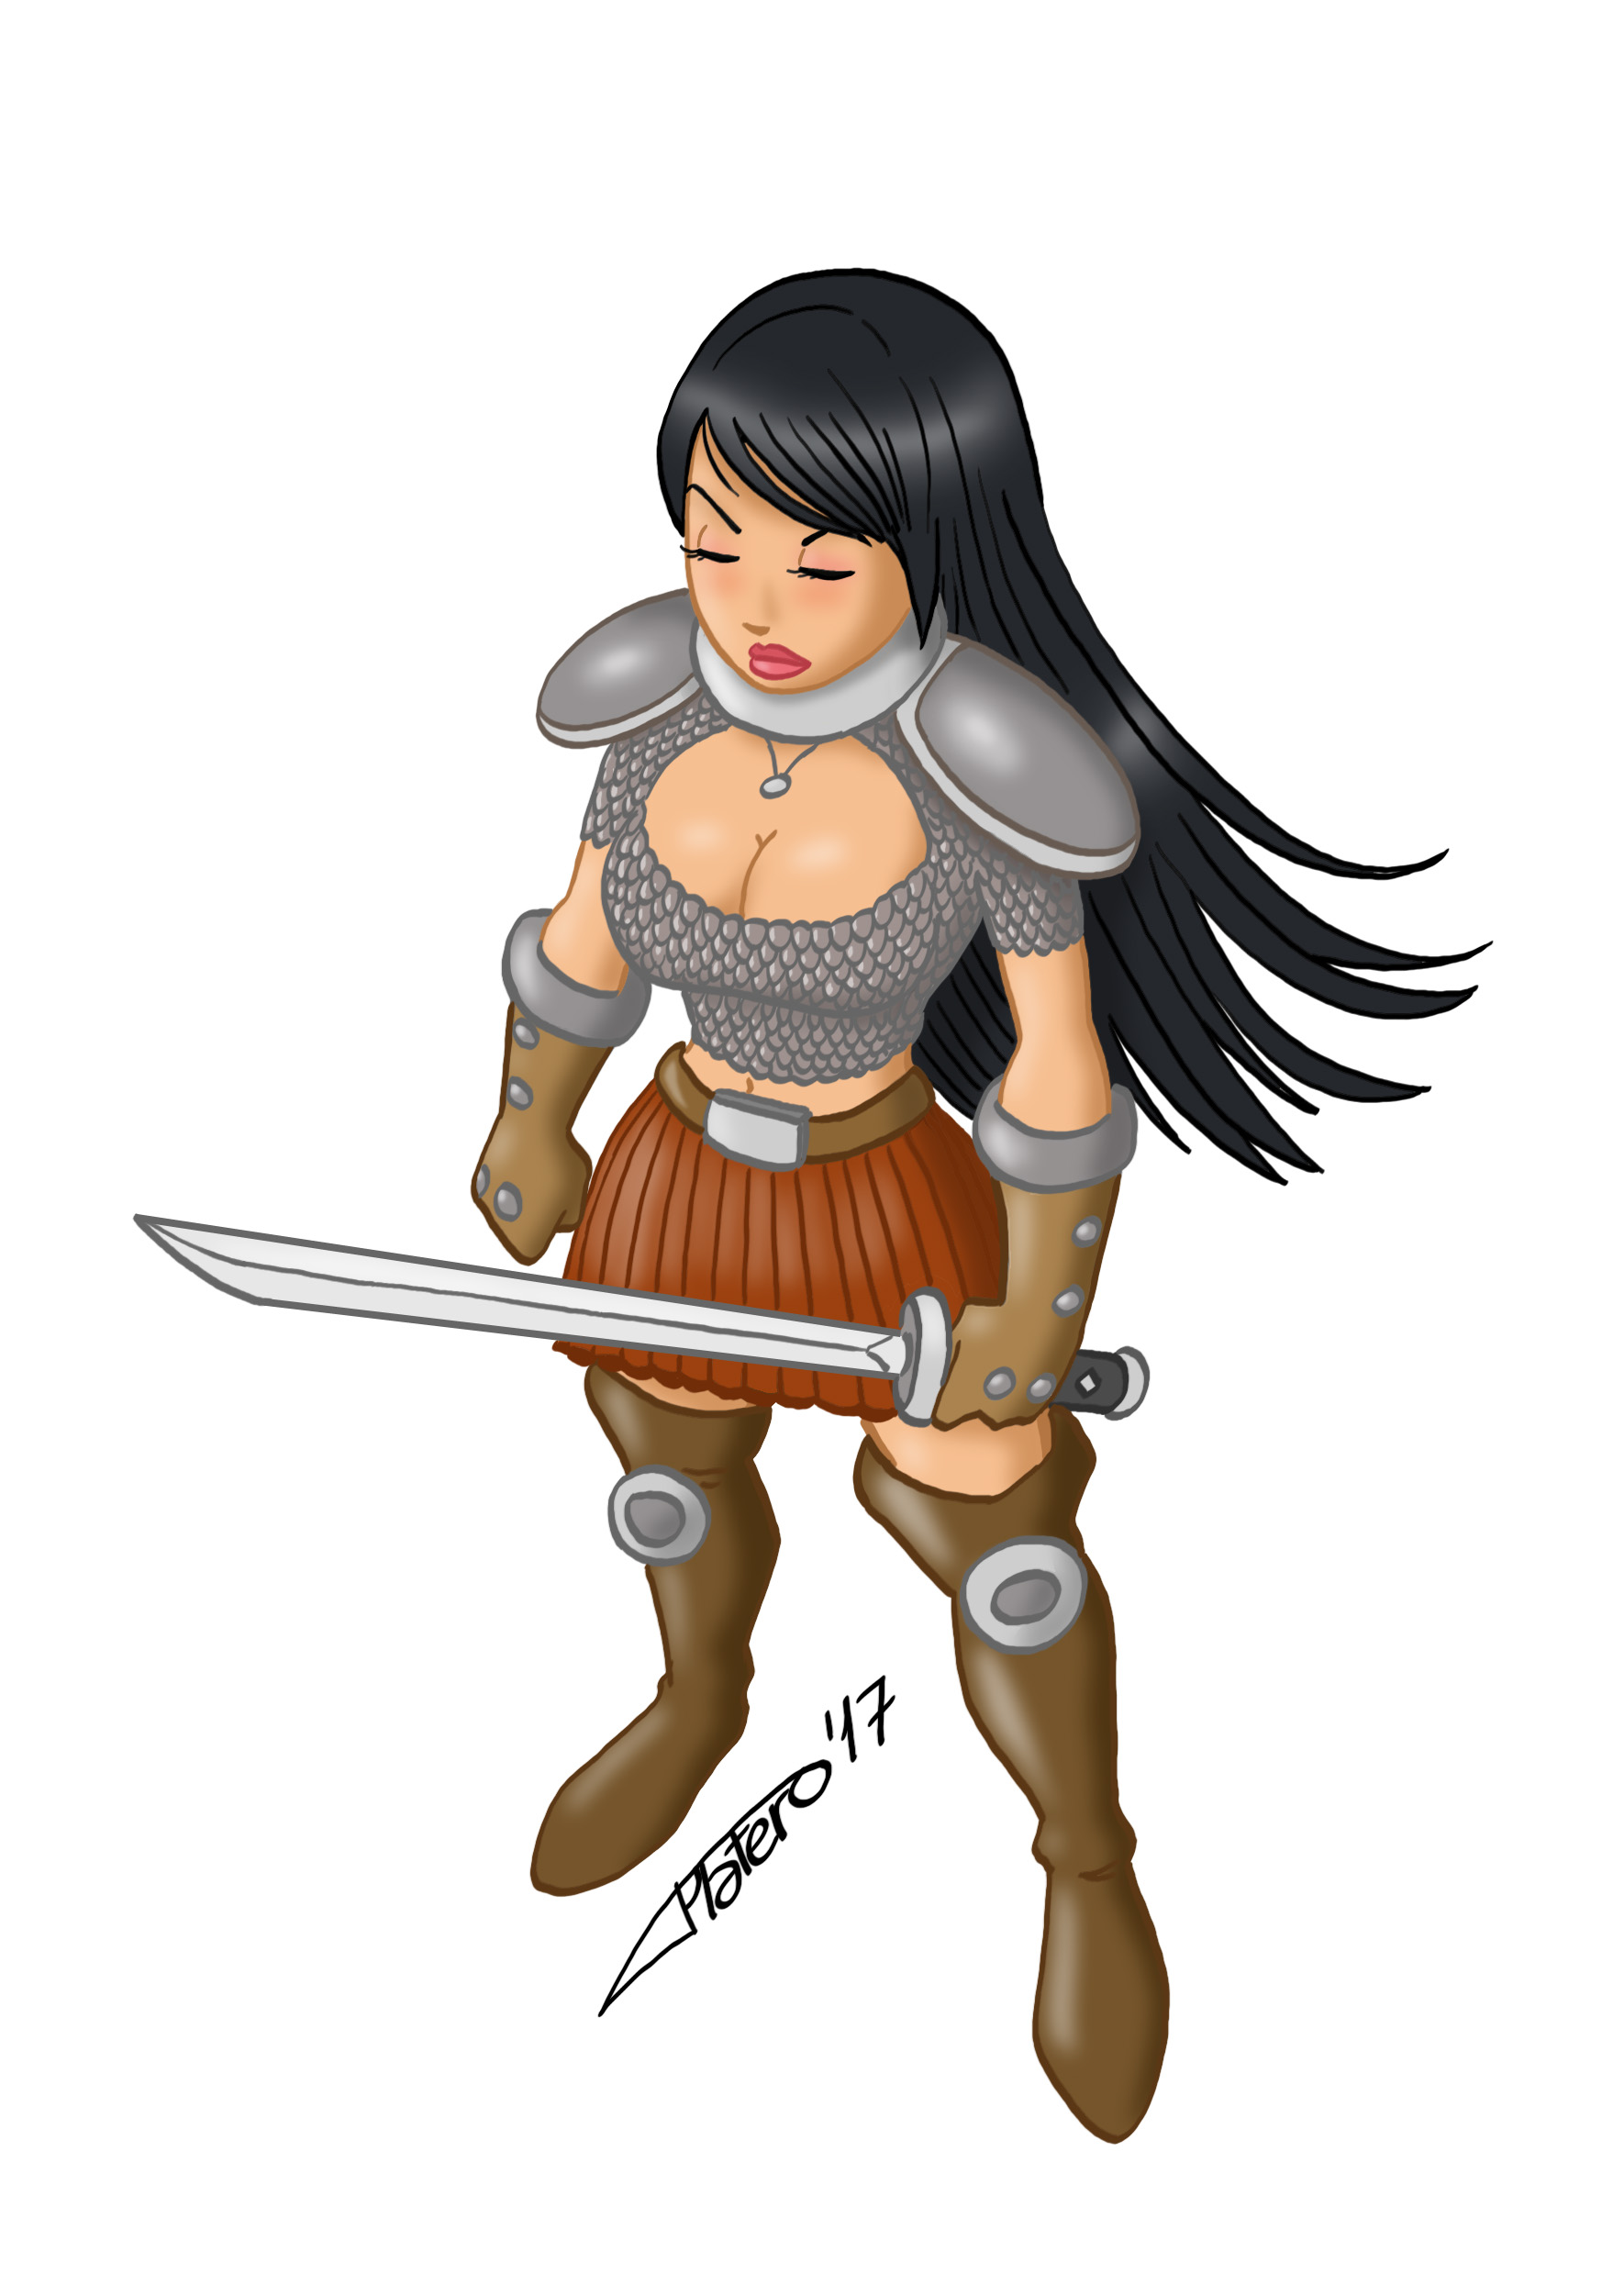 guerrera_samurai_ninja_jose_luis_platero_boceto_sketch_fantasía